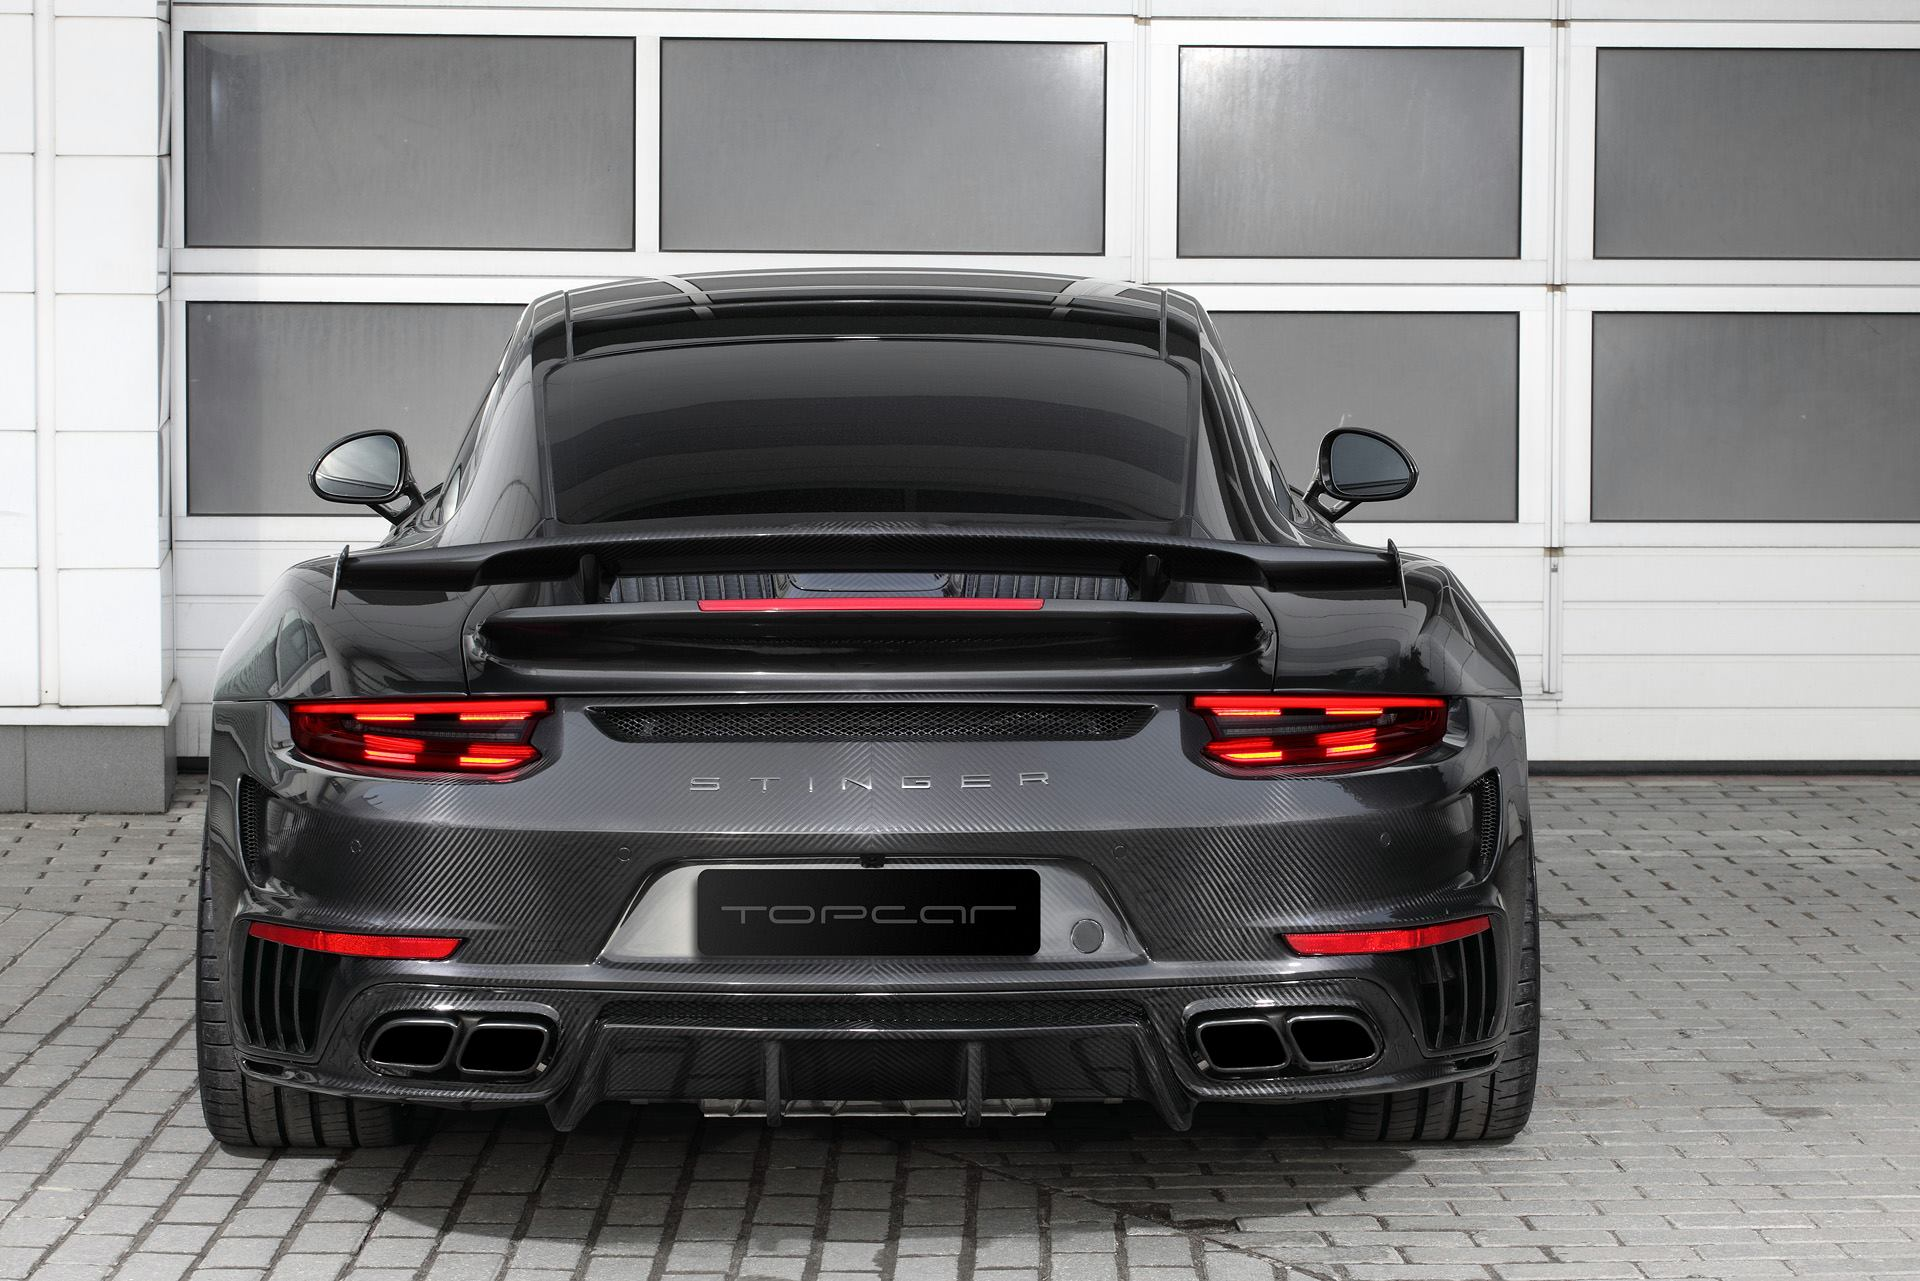 Porsche 911 Topcar Stinger GTR